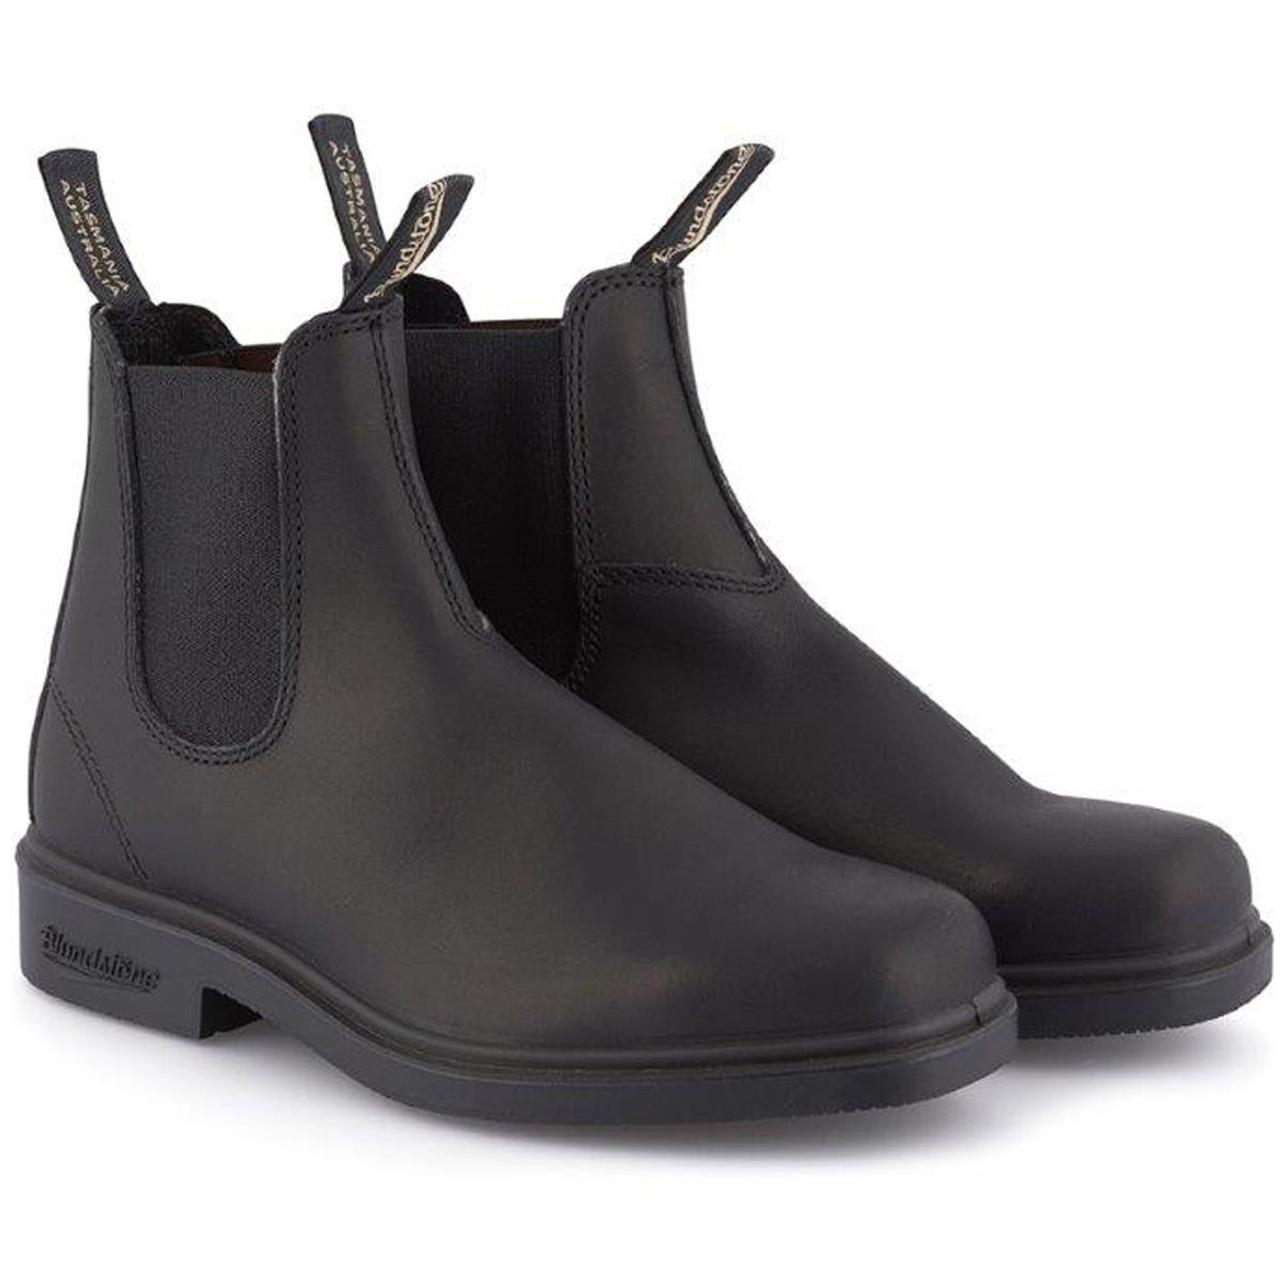 Blundstone Unisex Dress 063 Chelsea Boot